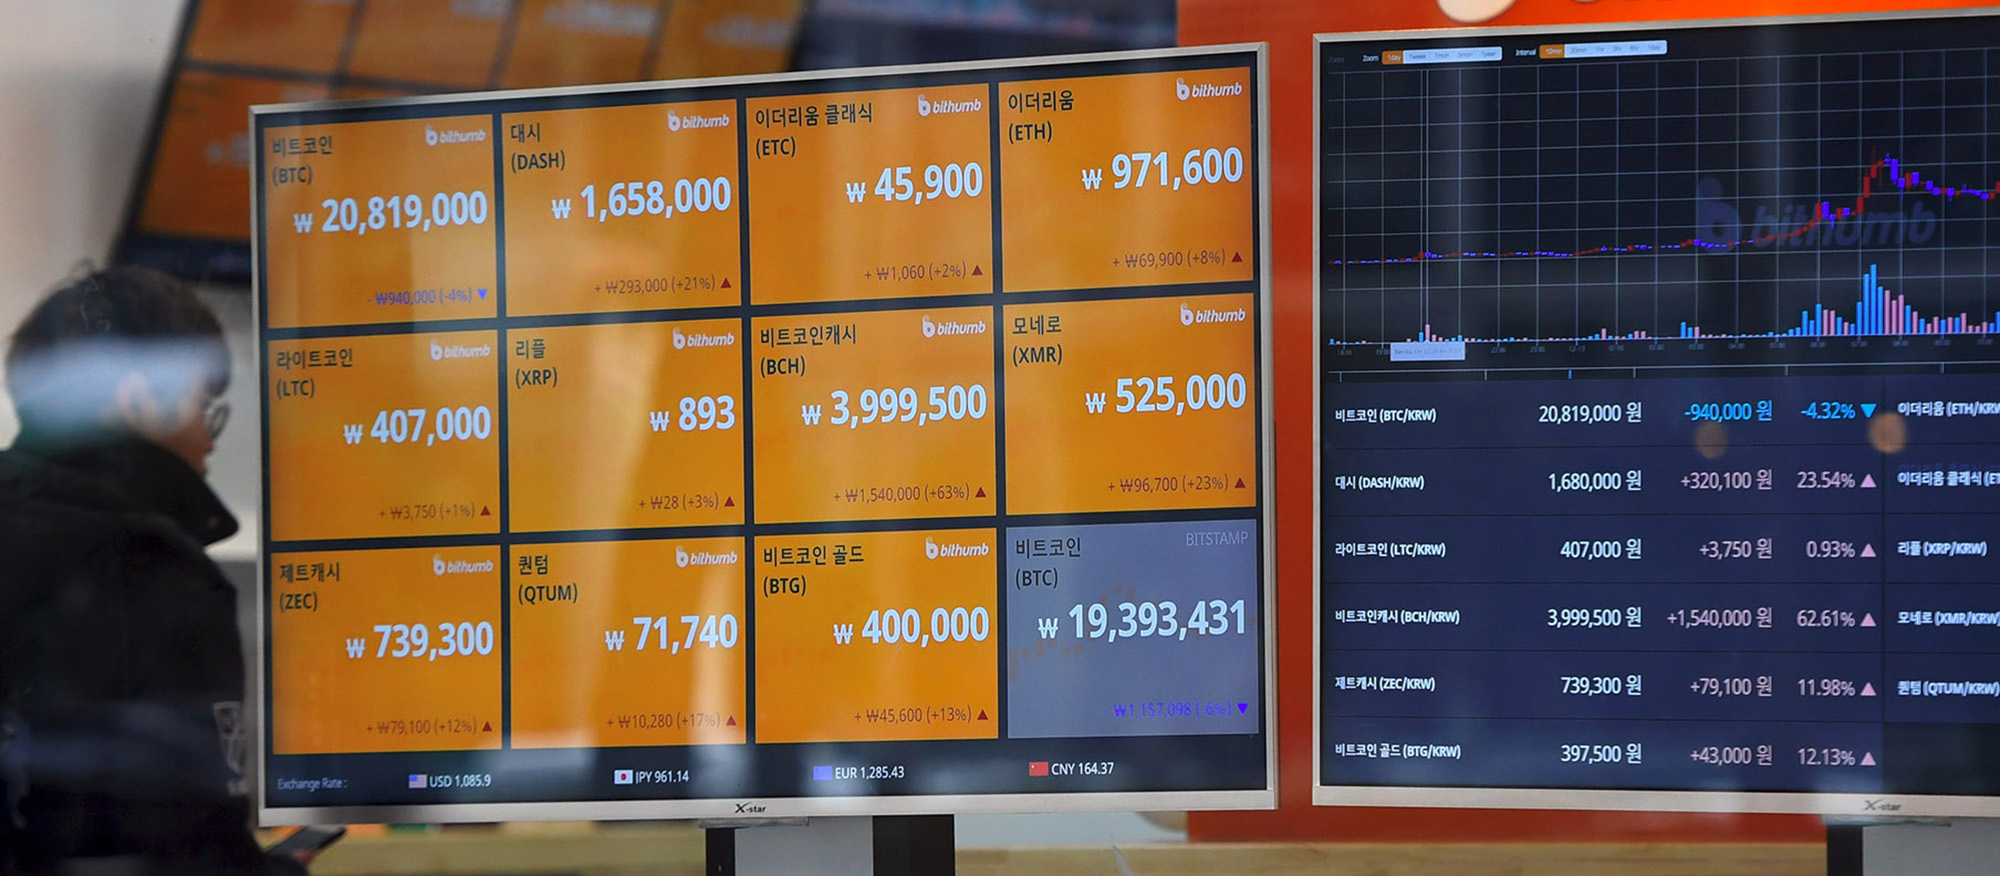 SEC Delays Cryptocurrency ETF Decisions Amid Market Concerns